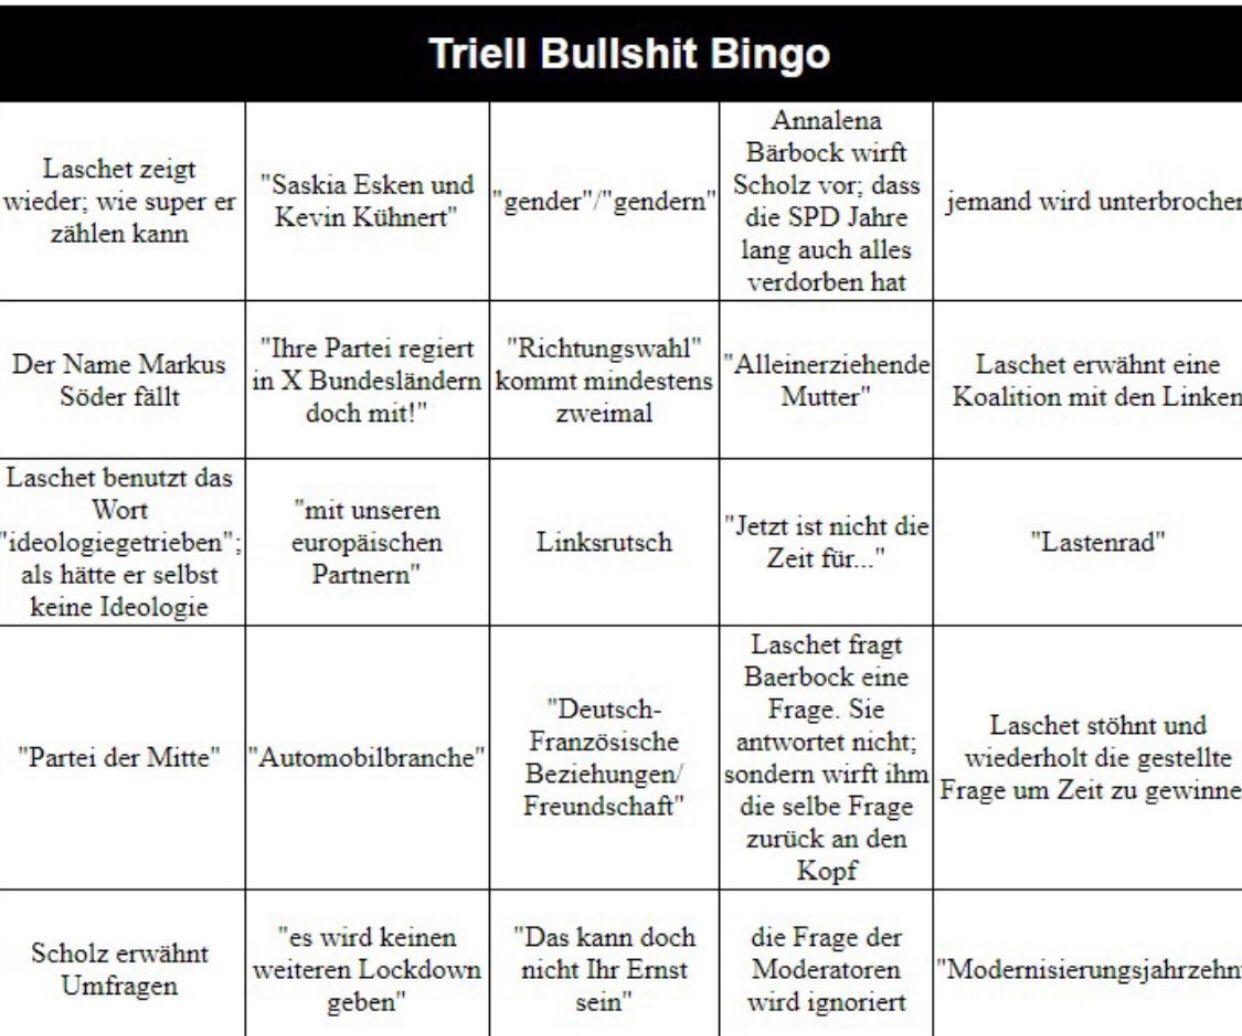 Triell-Bullshit-Bingo.jpg